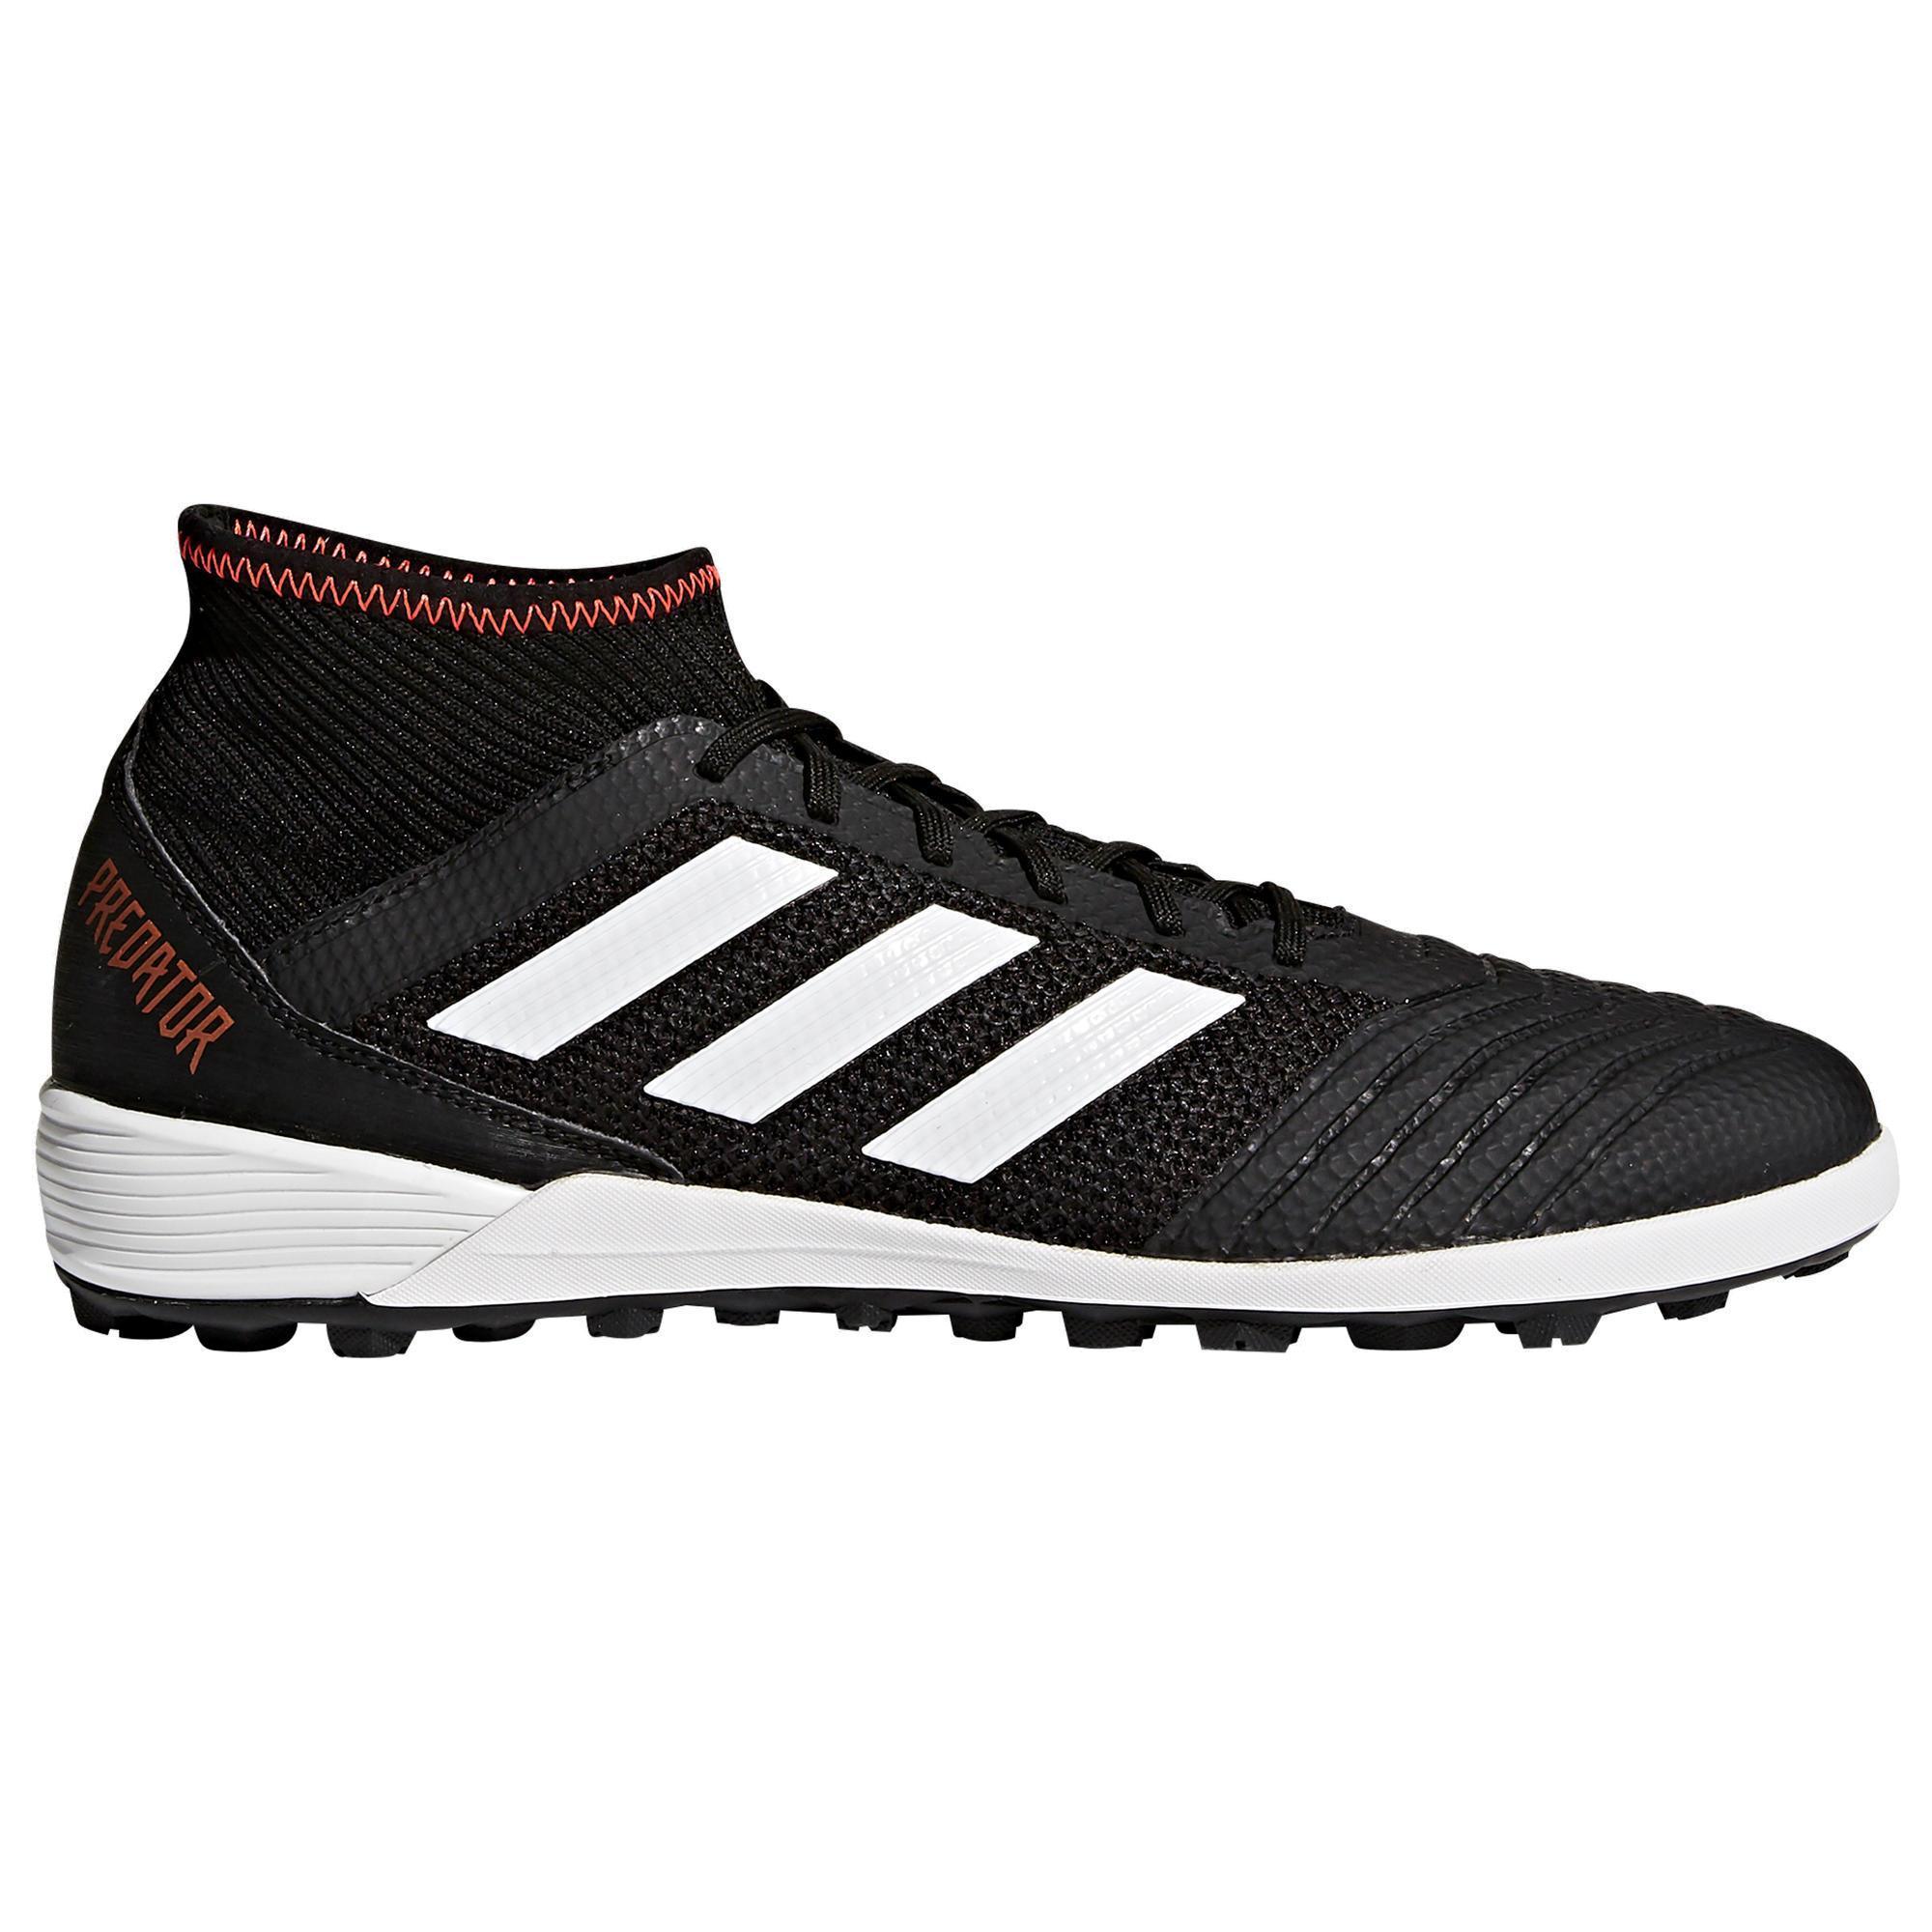 half off temperament shoes new products Chaussure de futsal enfant Predator 18.3 TF